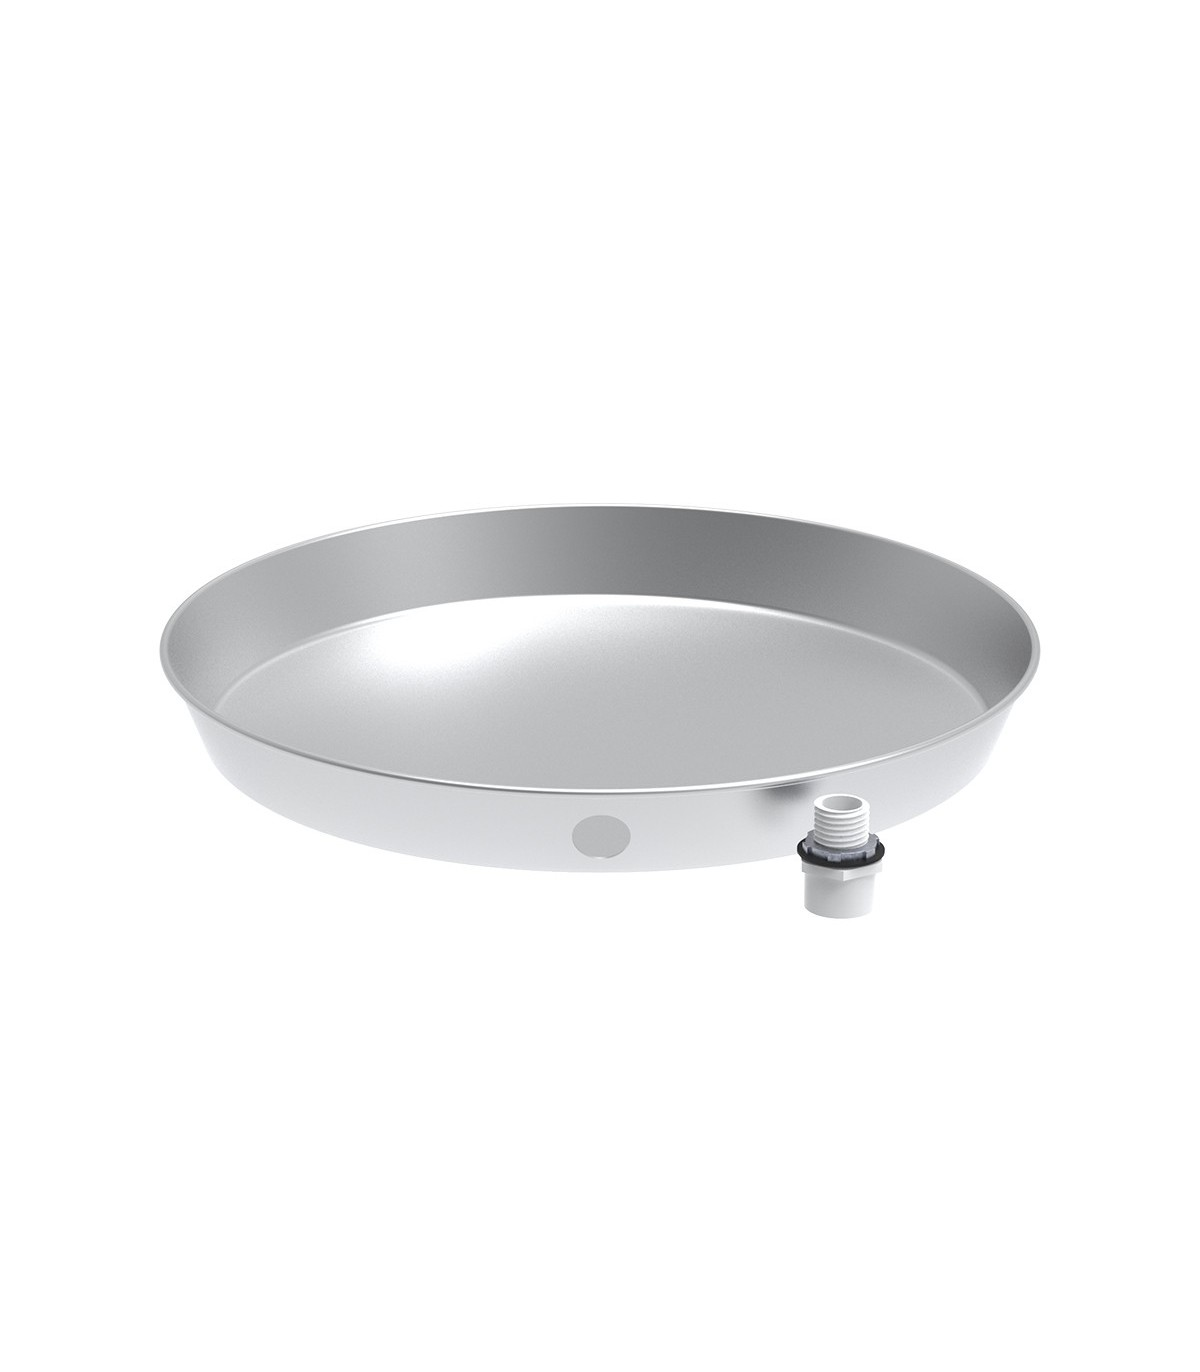 20 Quot Water Heater Drain Pan